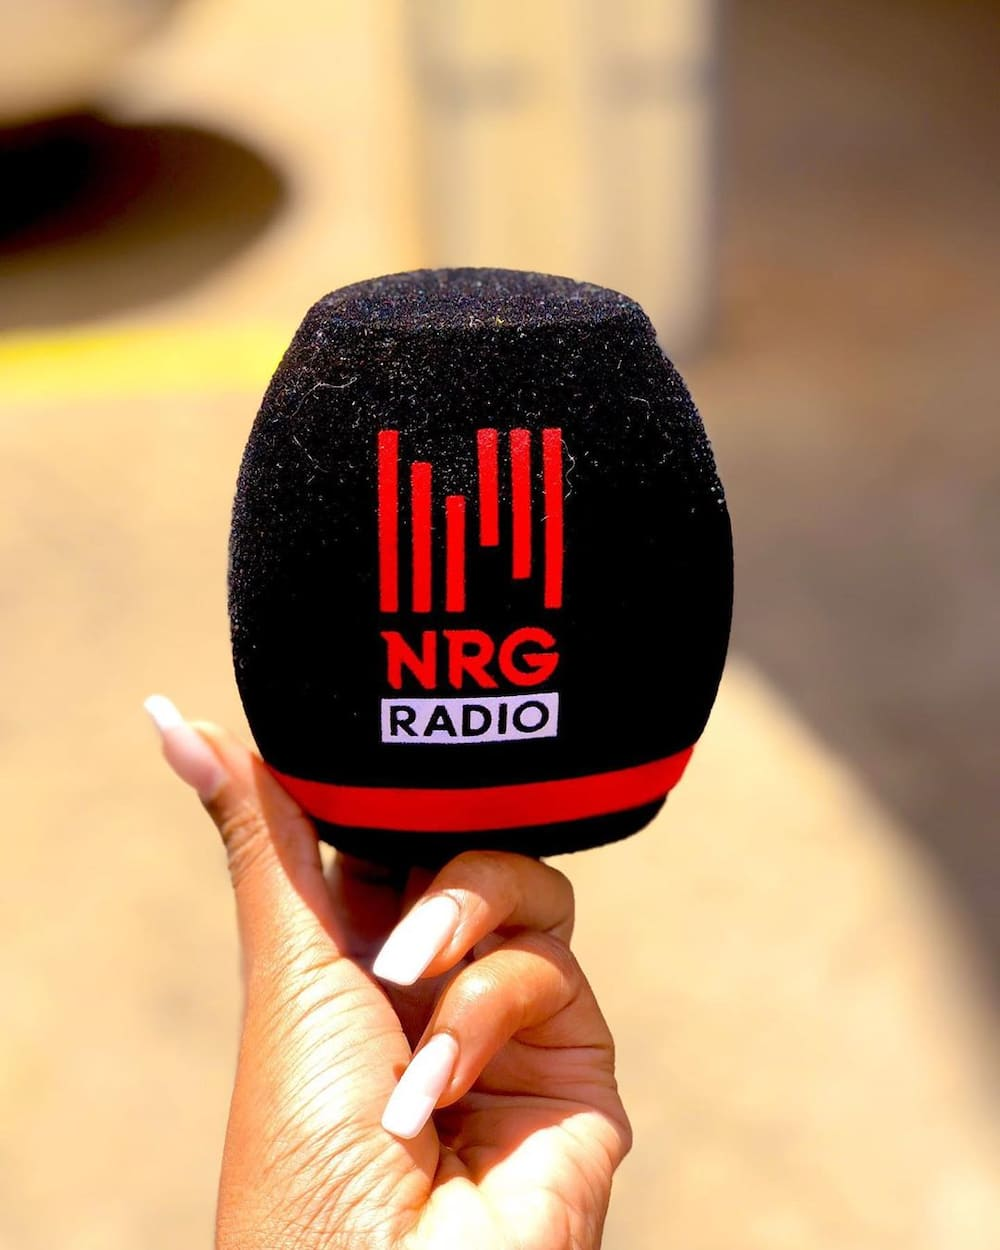 Who owns NRG radio?